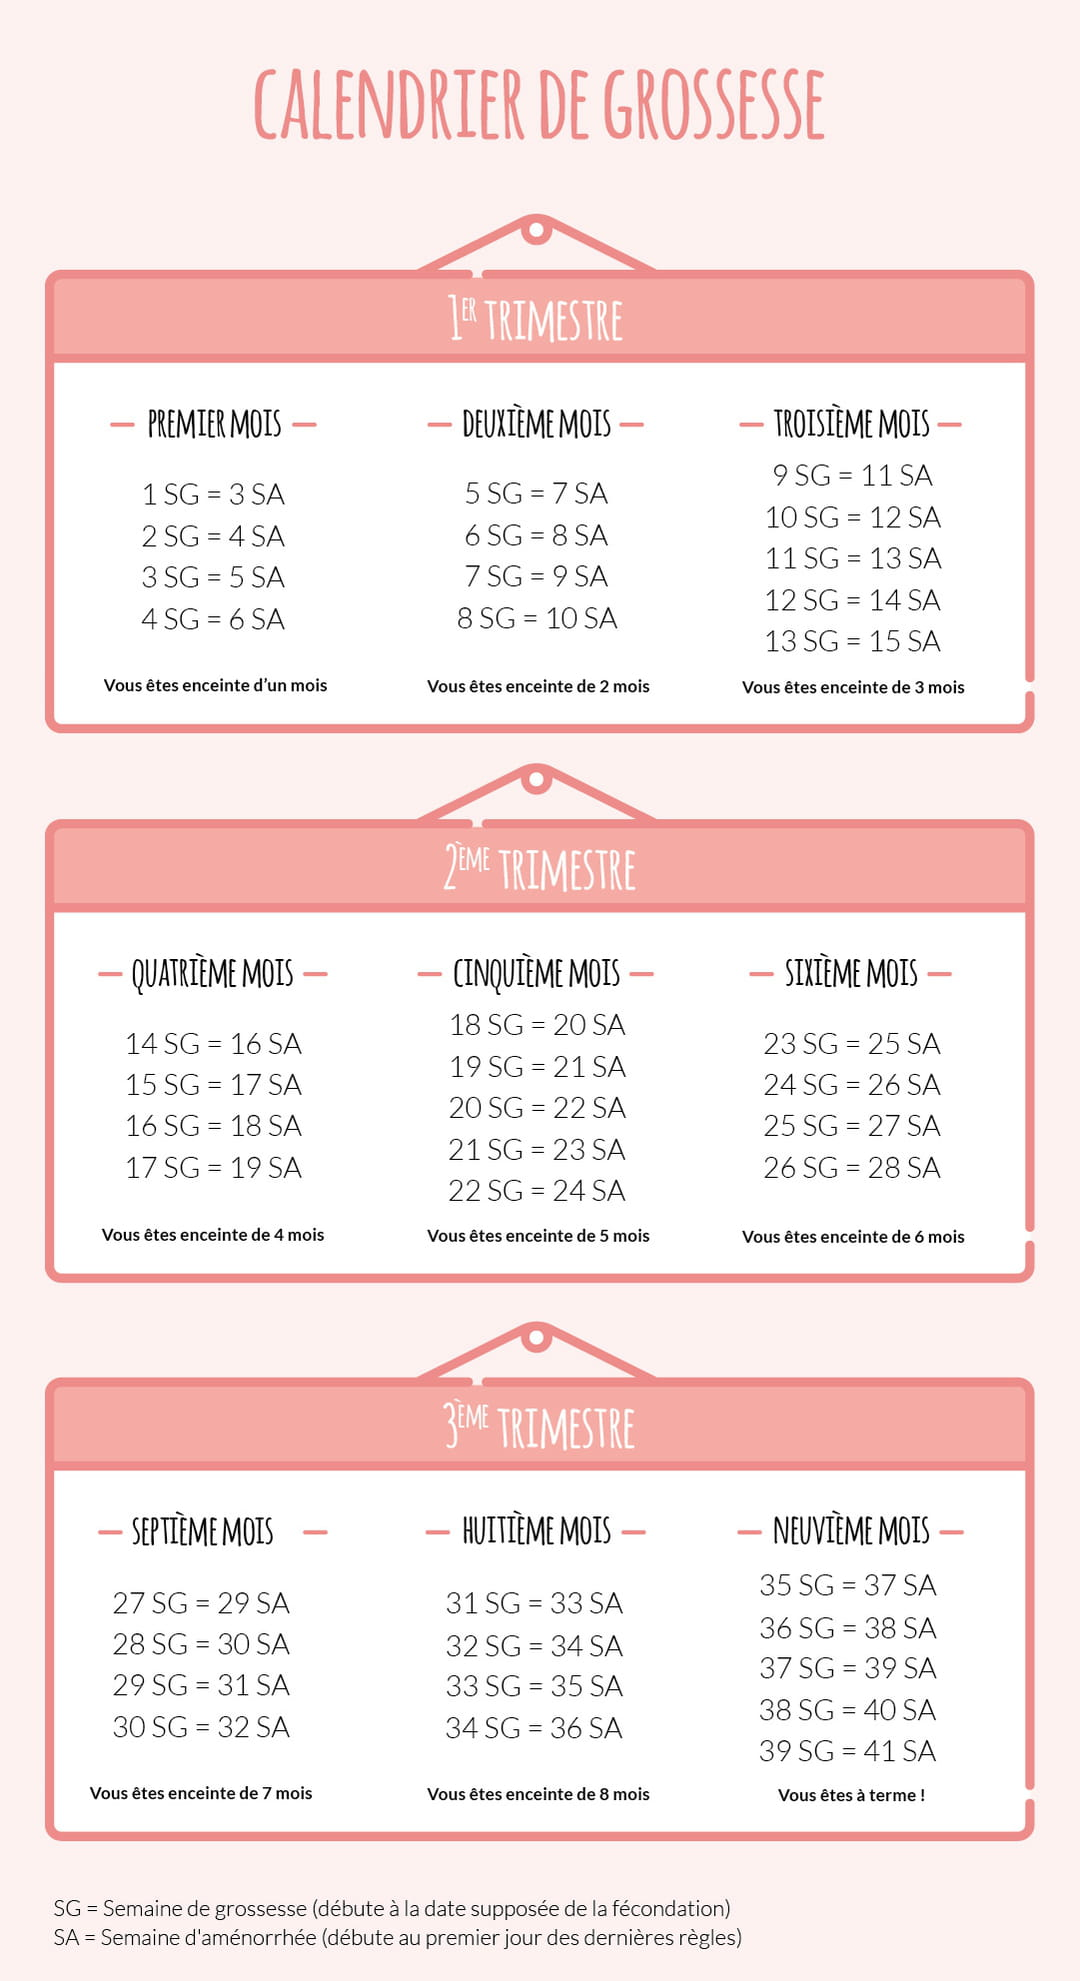 calendrier-de-grossesse